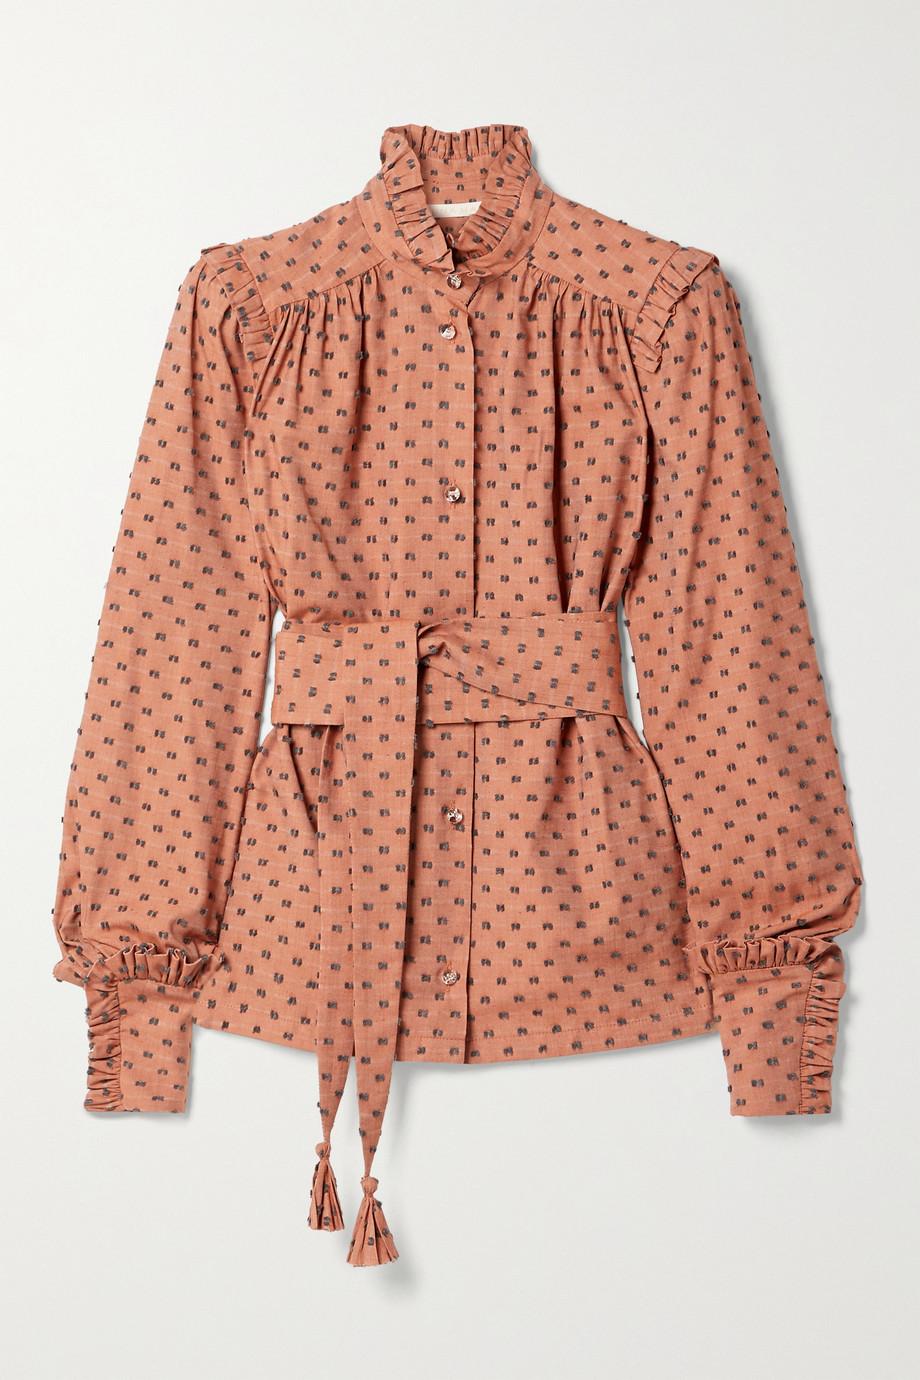 Anna Mason Deneuve 配腰带褶饰刺绣提花棉质混纺斜纹布女衫